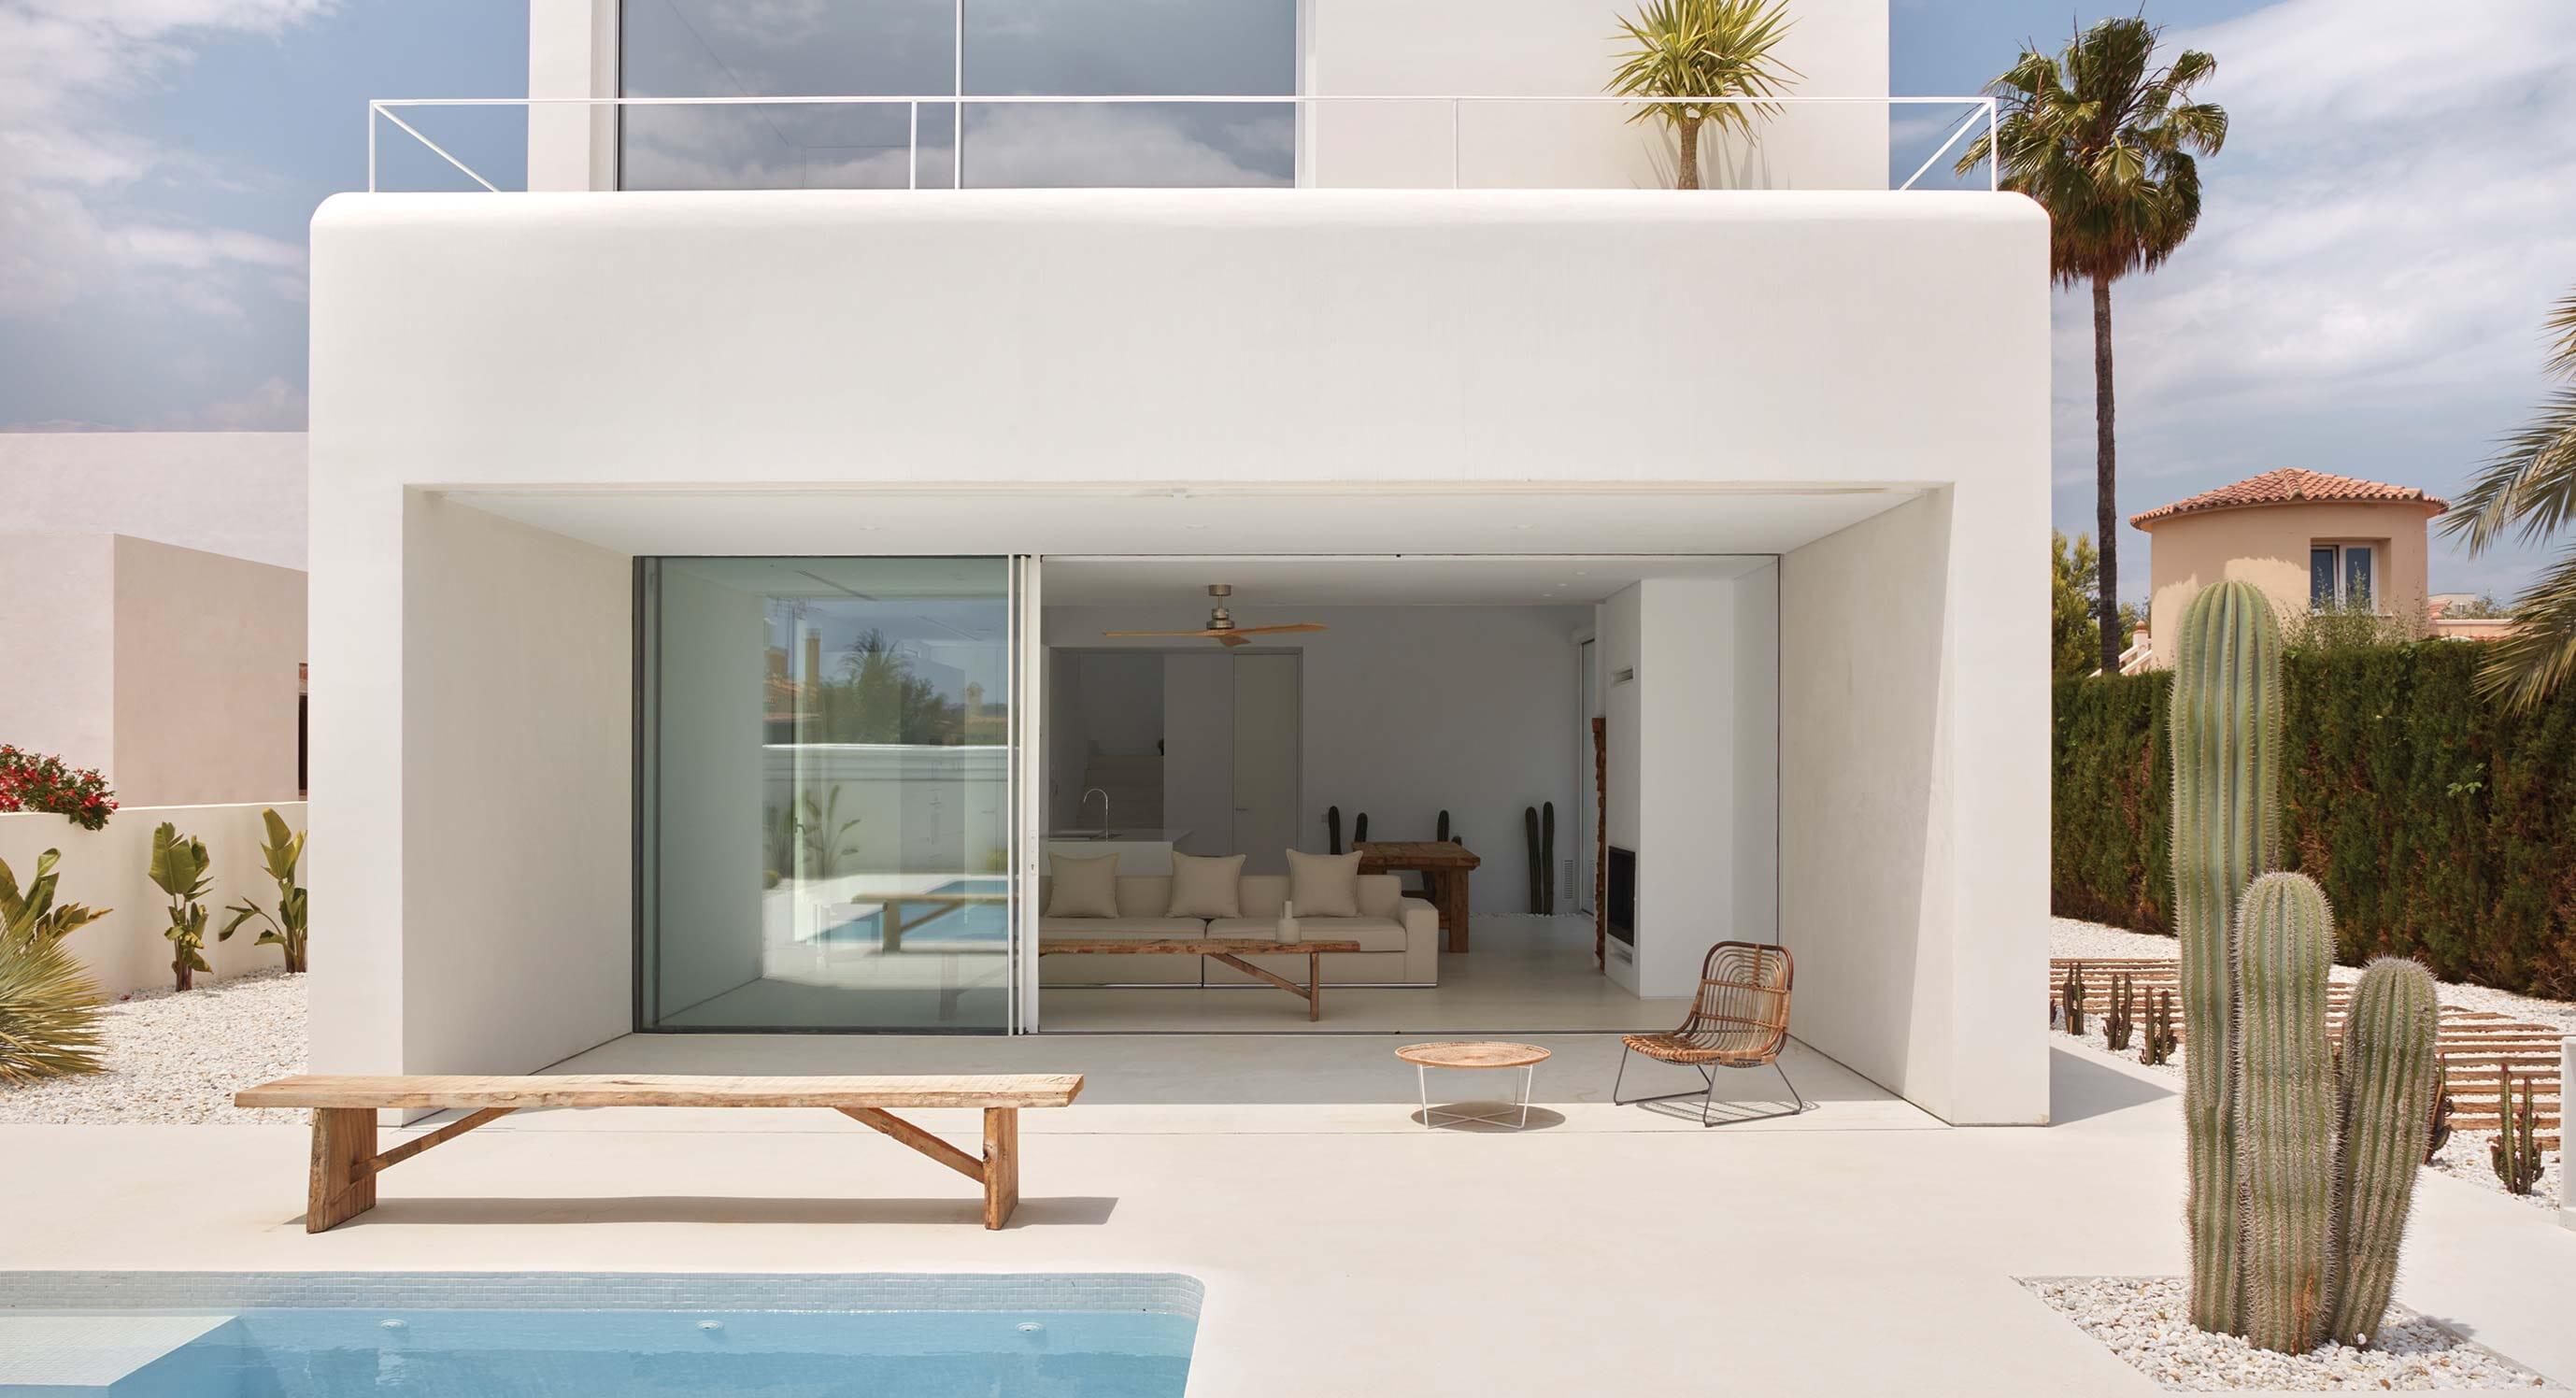 How The Spirit Of Ibiza Is Recreated In Spanish Suburbia